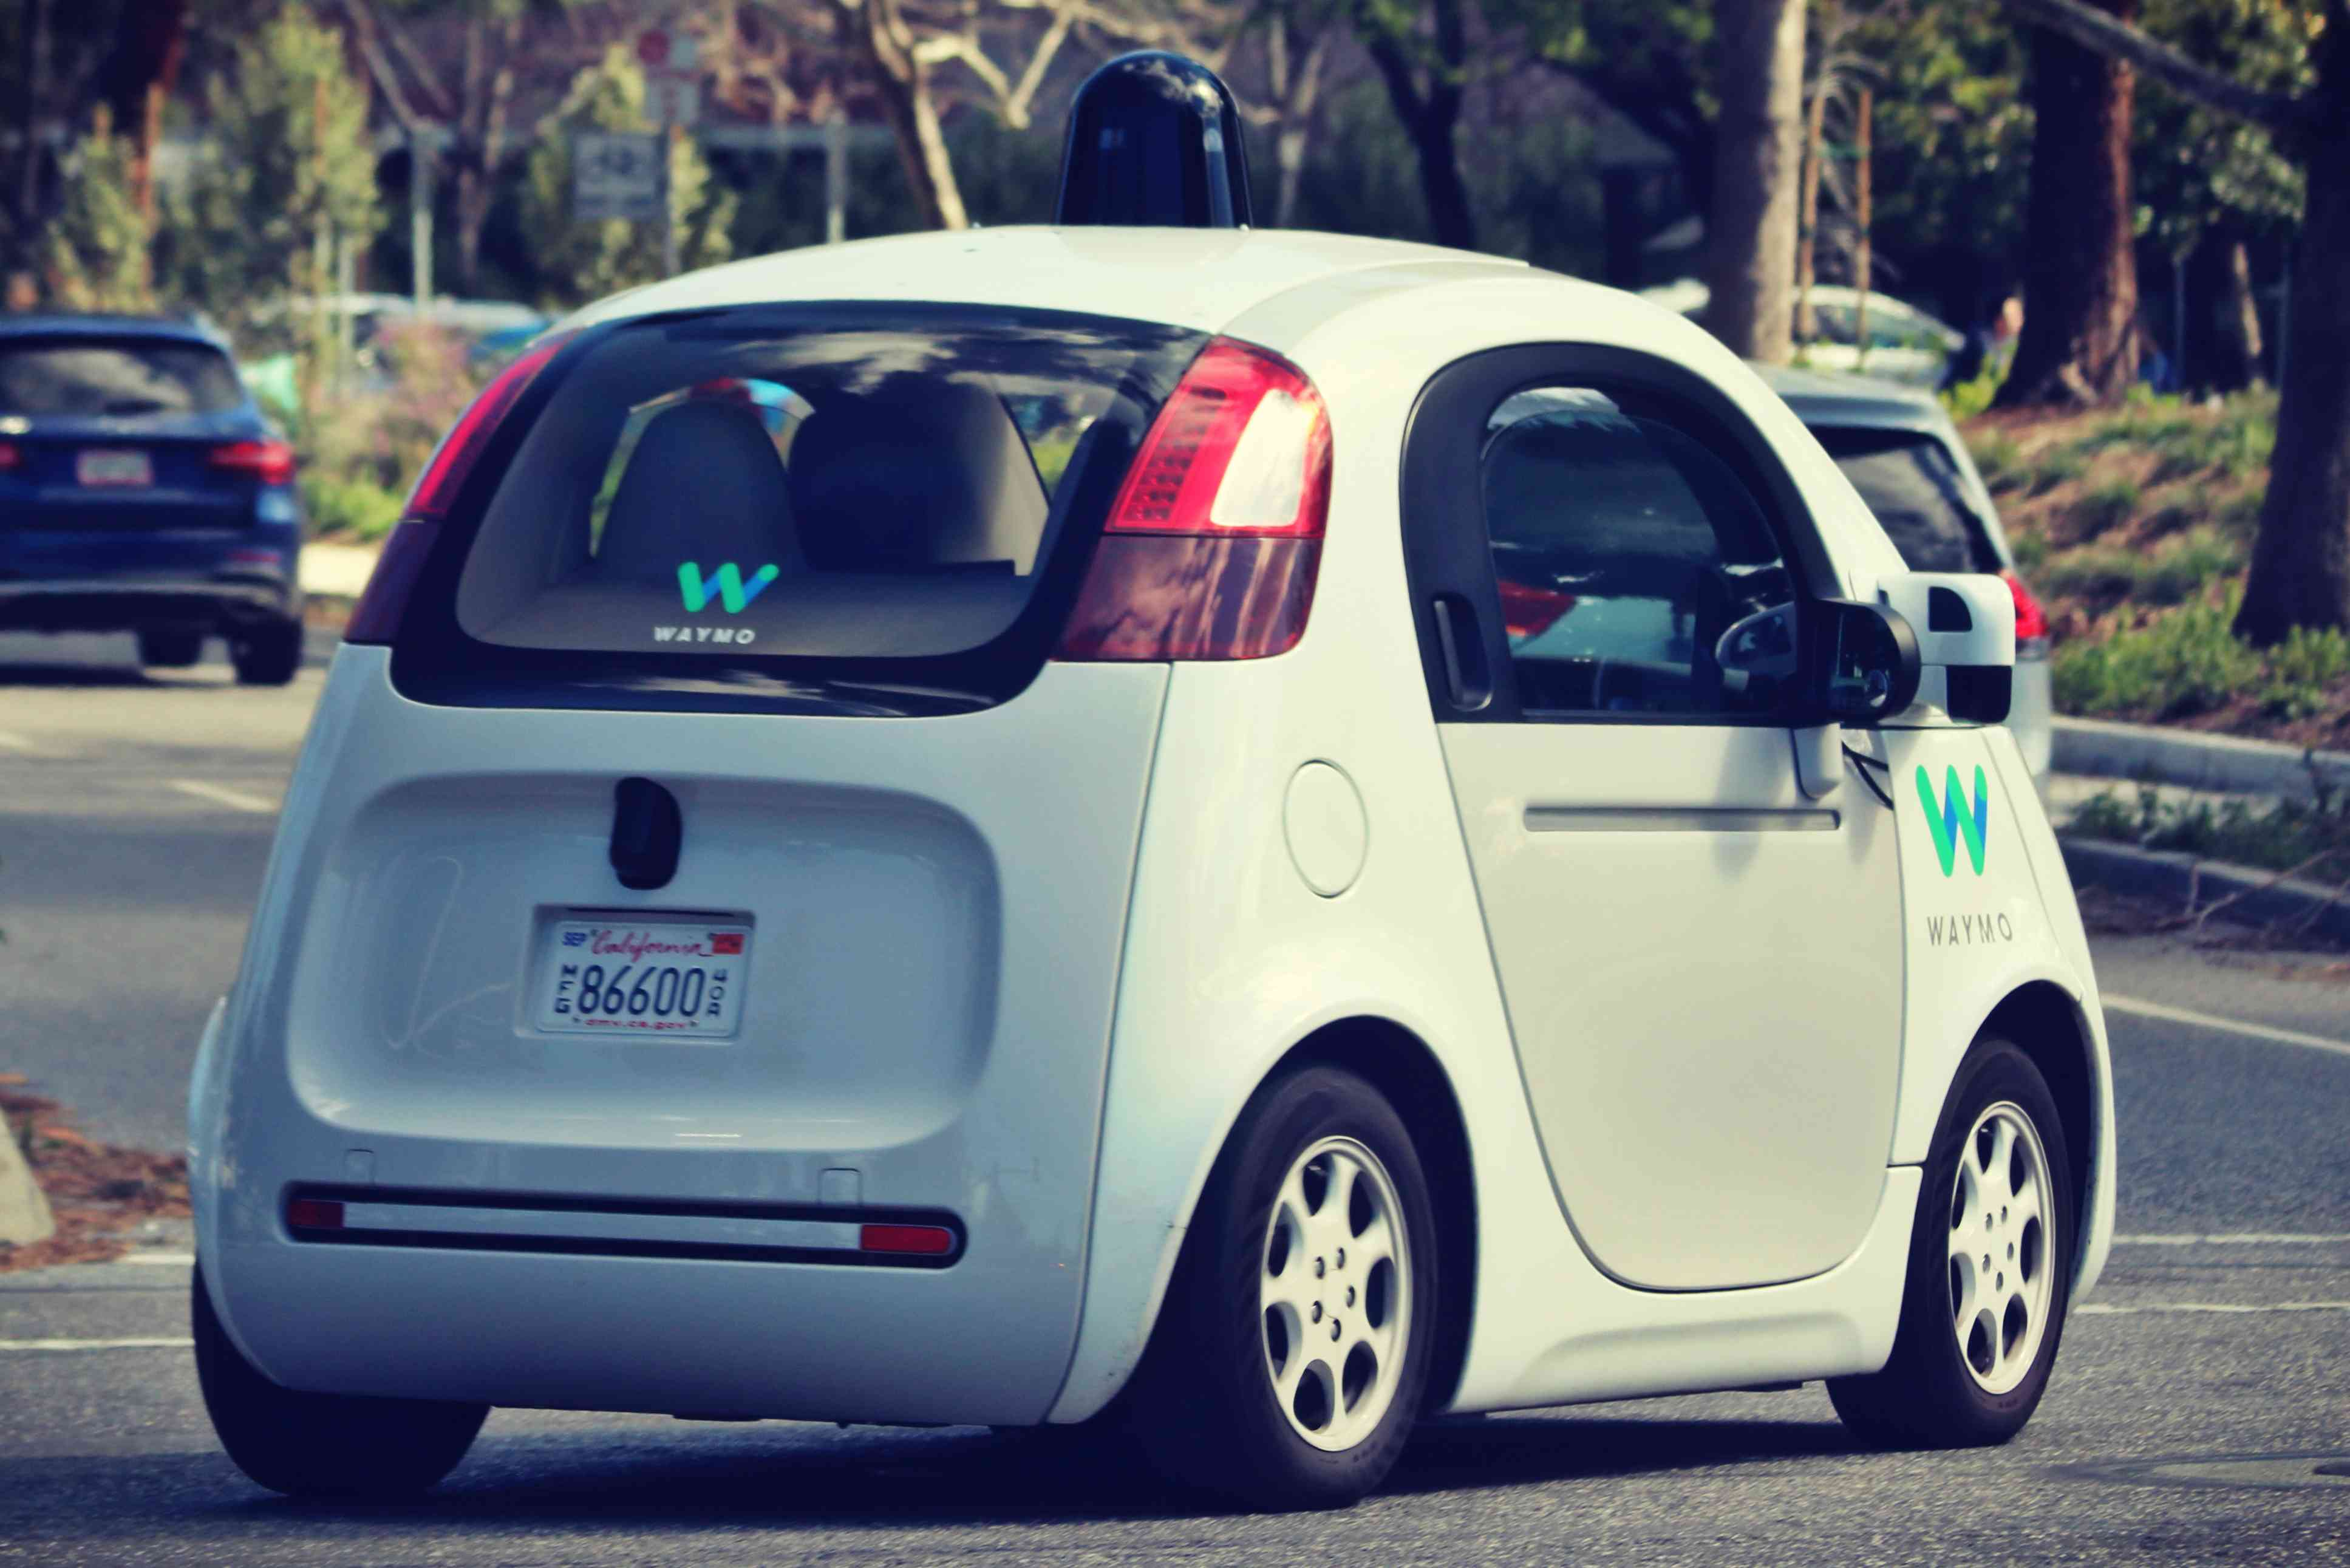 Meet Waymo: A Self-Driving Car by Google